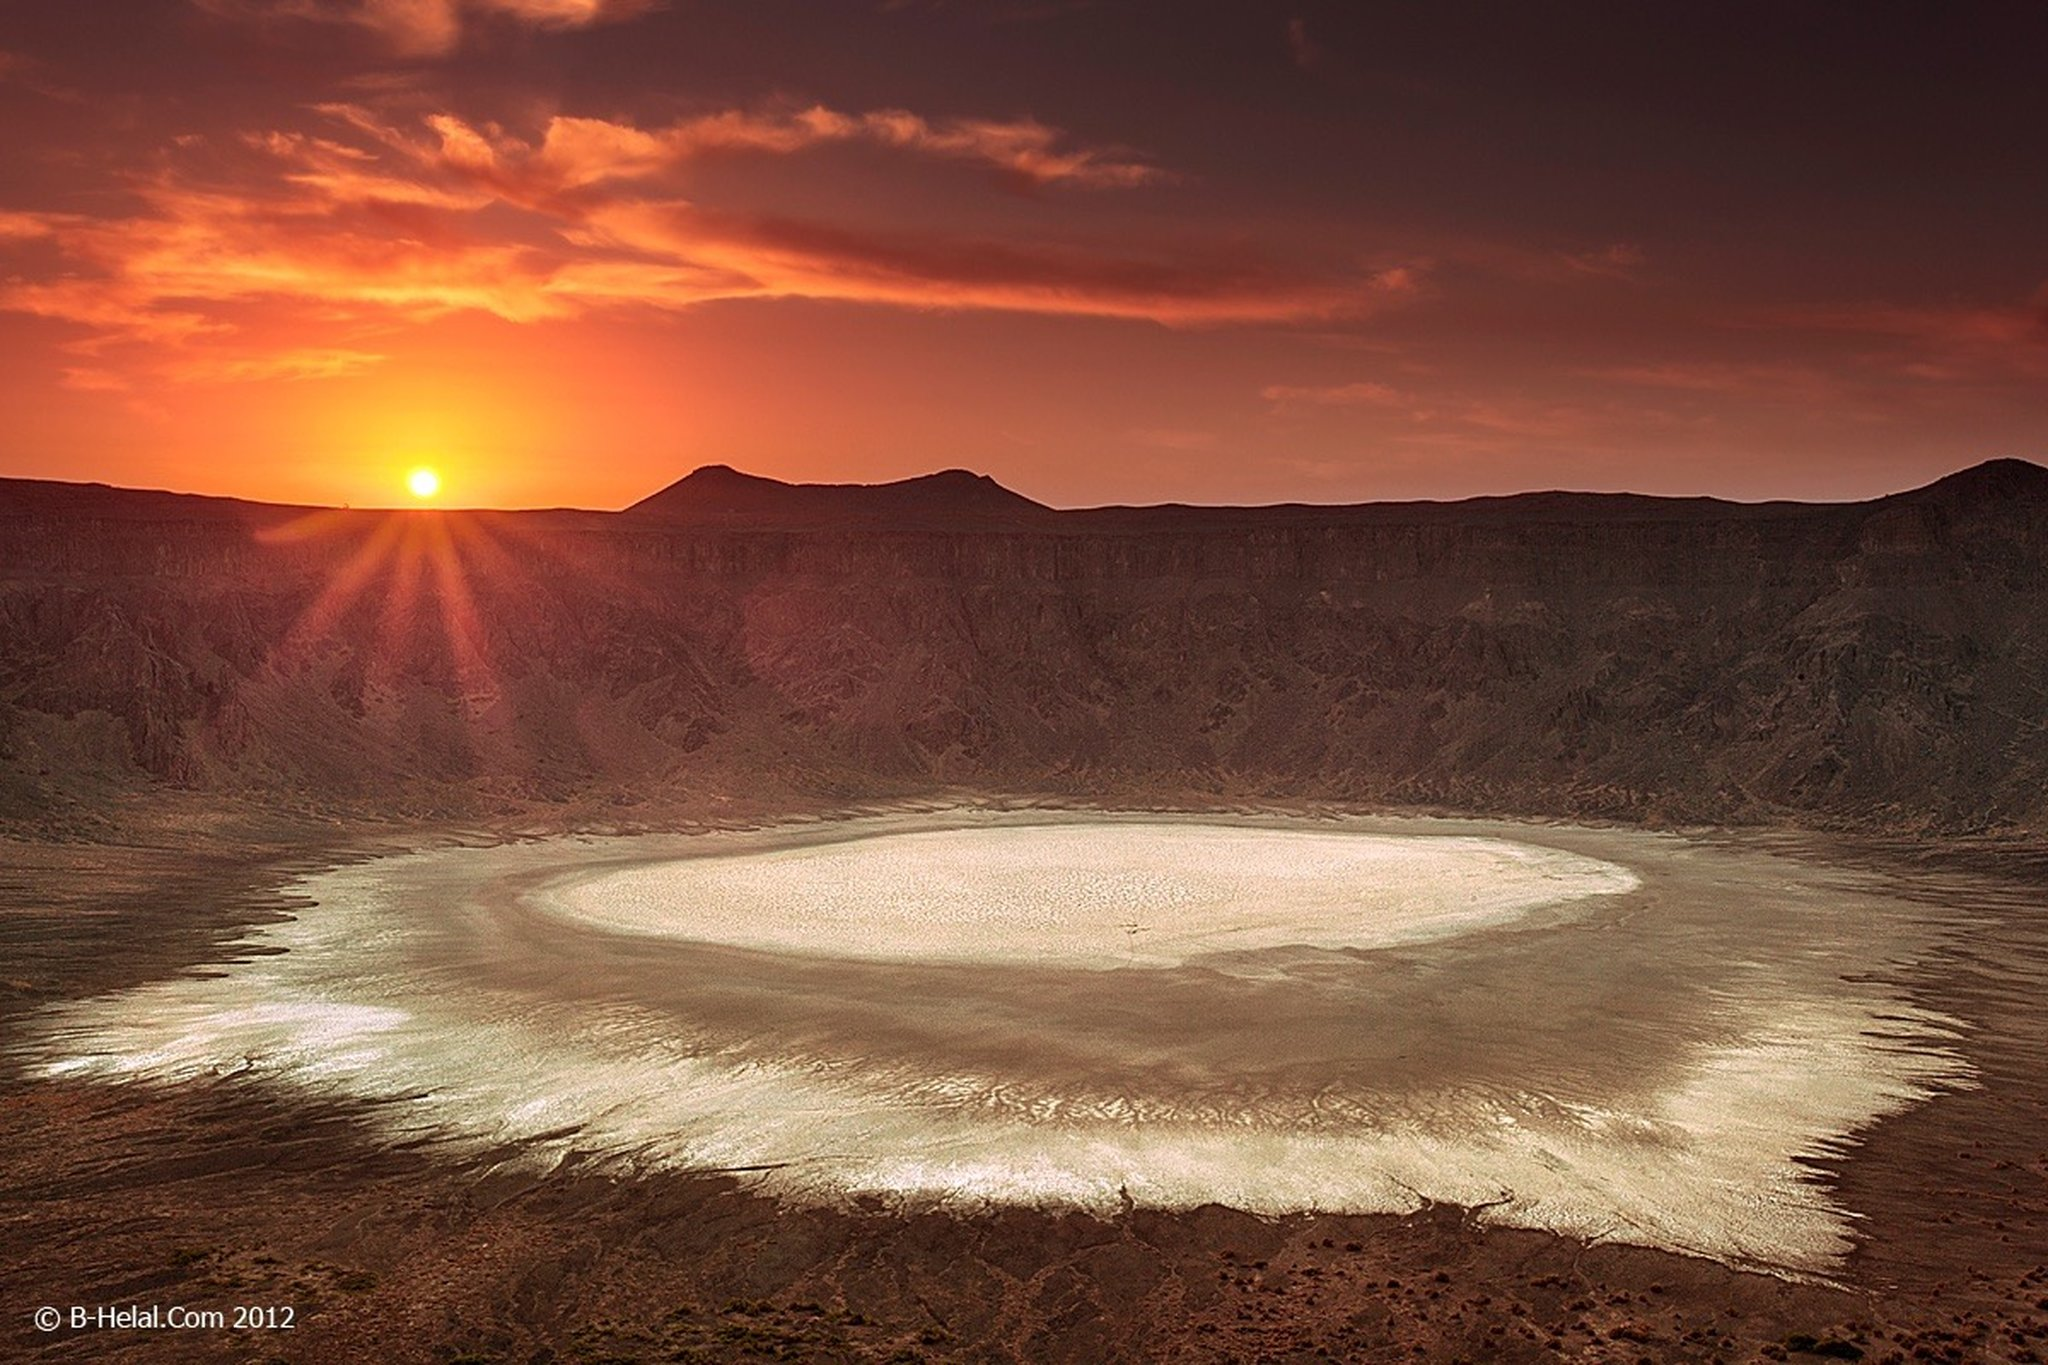 UNIK: Al-Wahbah, kawah gunung di tengah padang pasir.